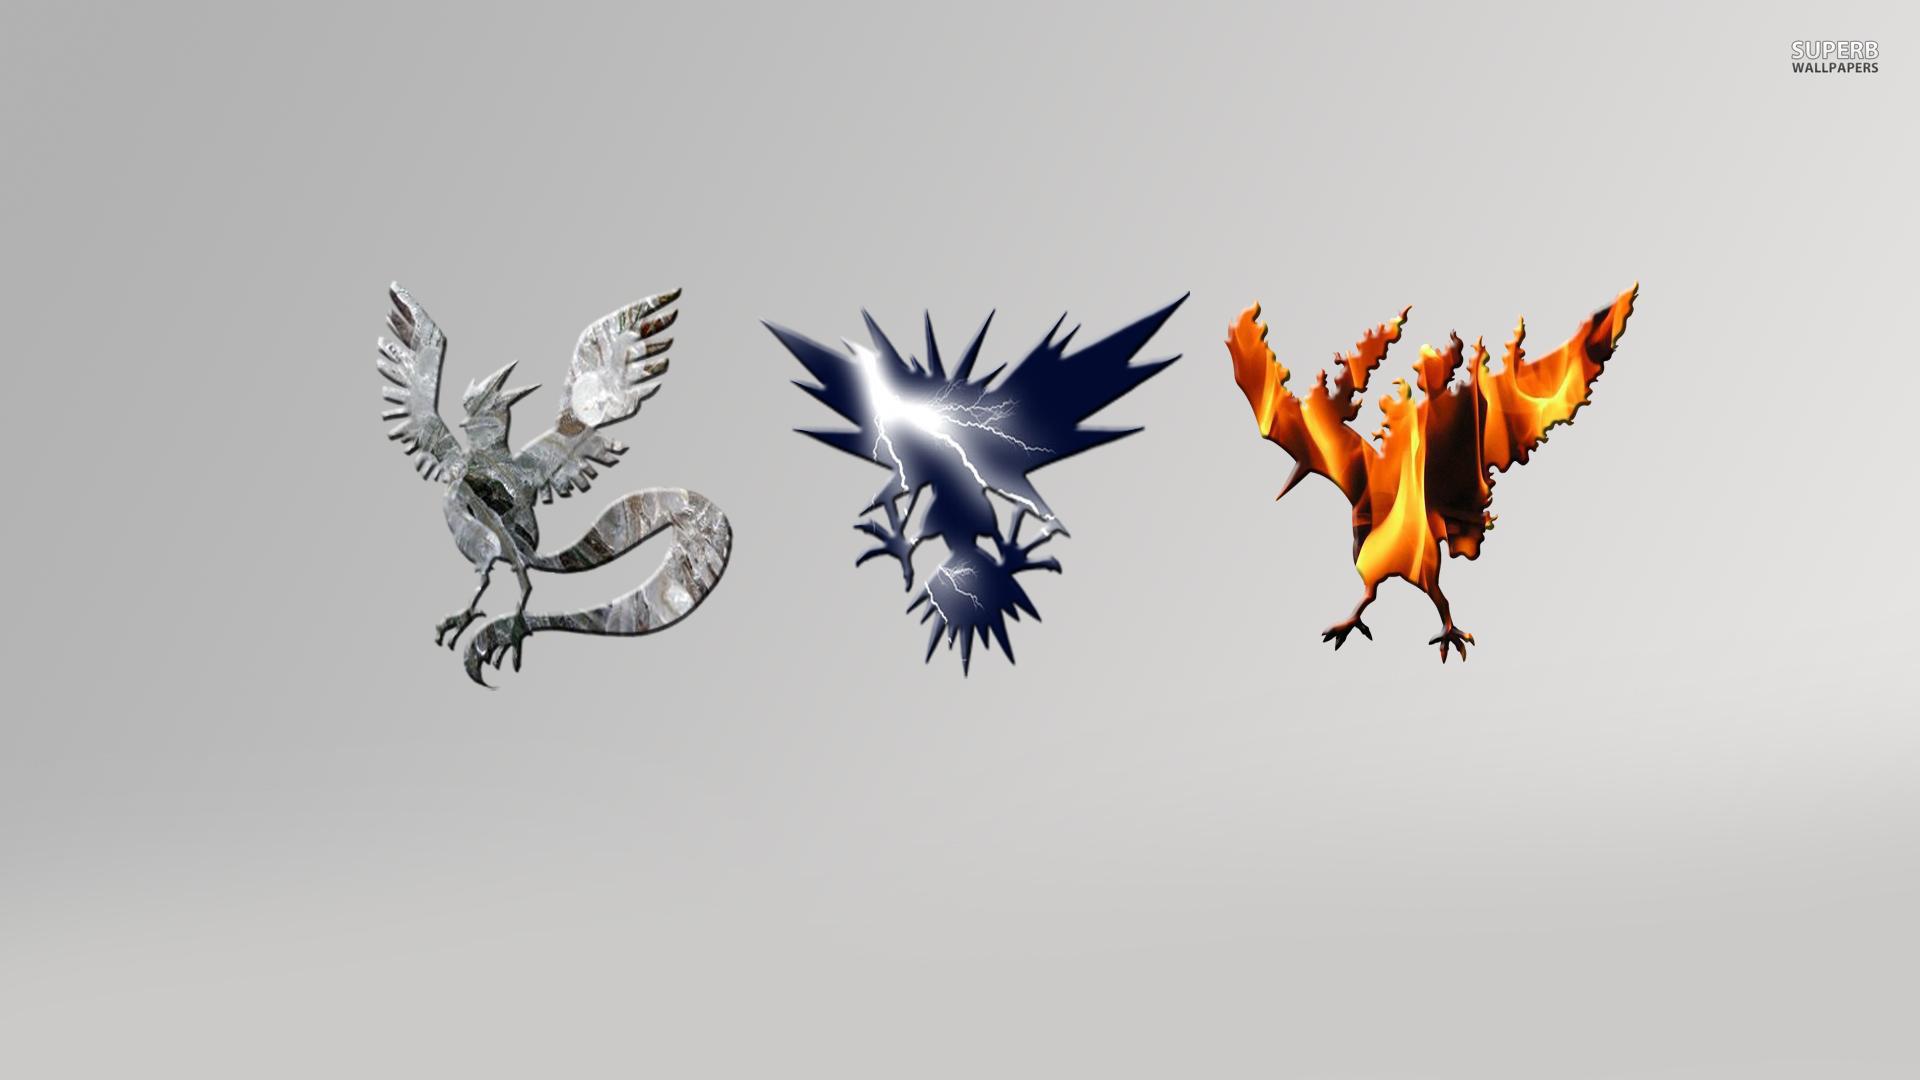 pokemon wallpaper HD for desktop (9)